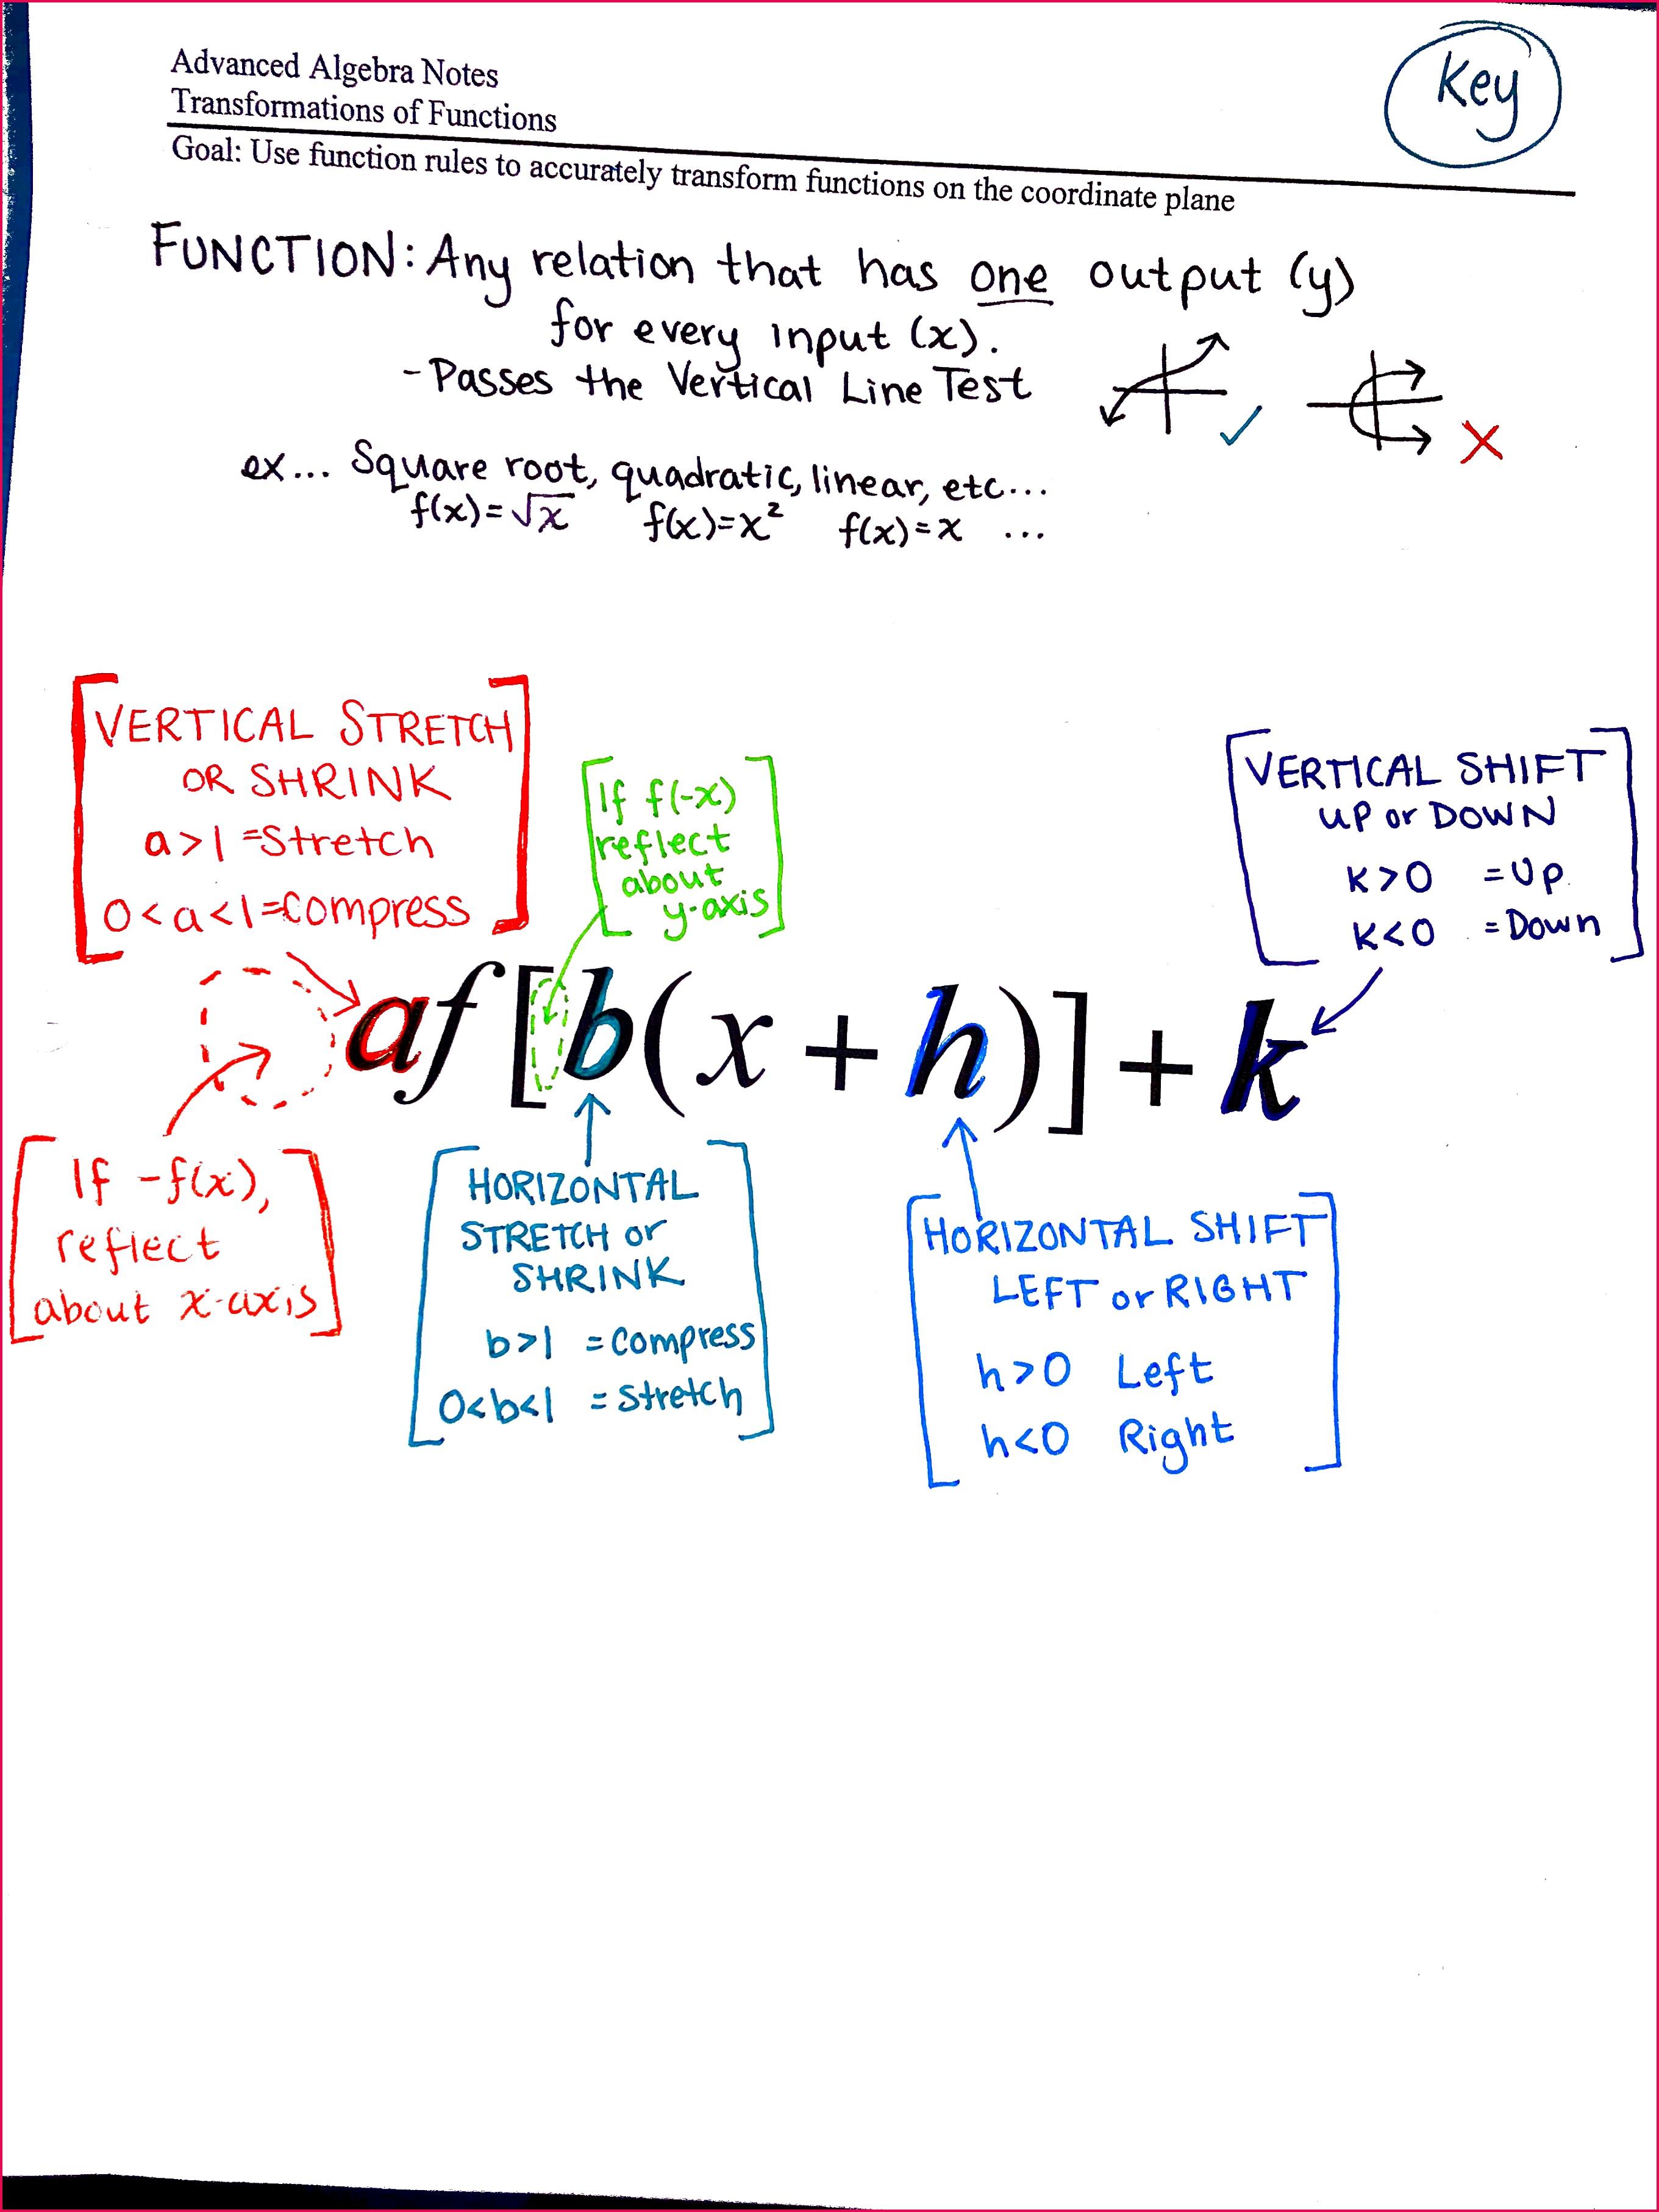 Adv Alg Day 1 Transformation Notes JPG